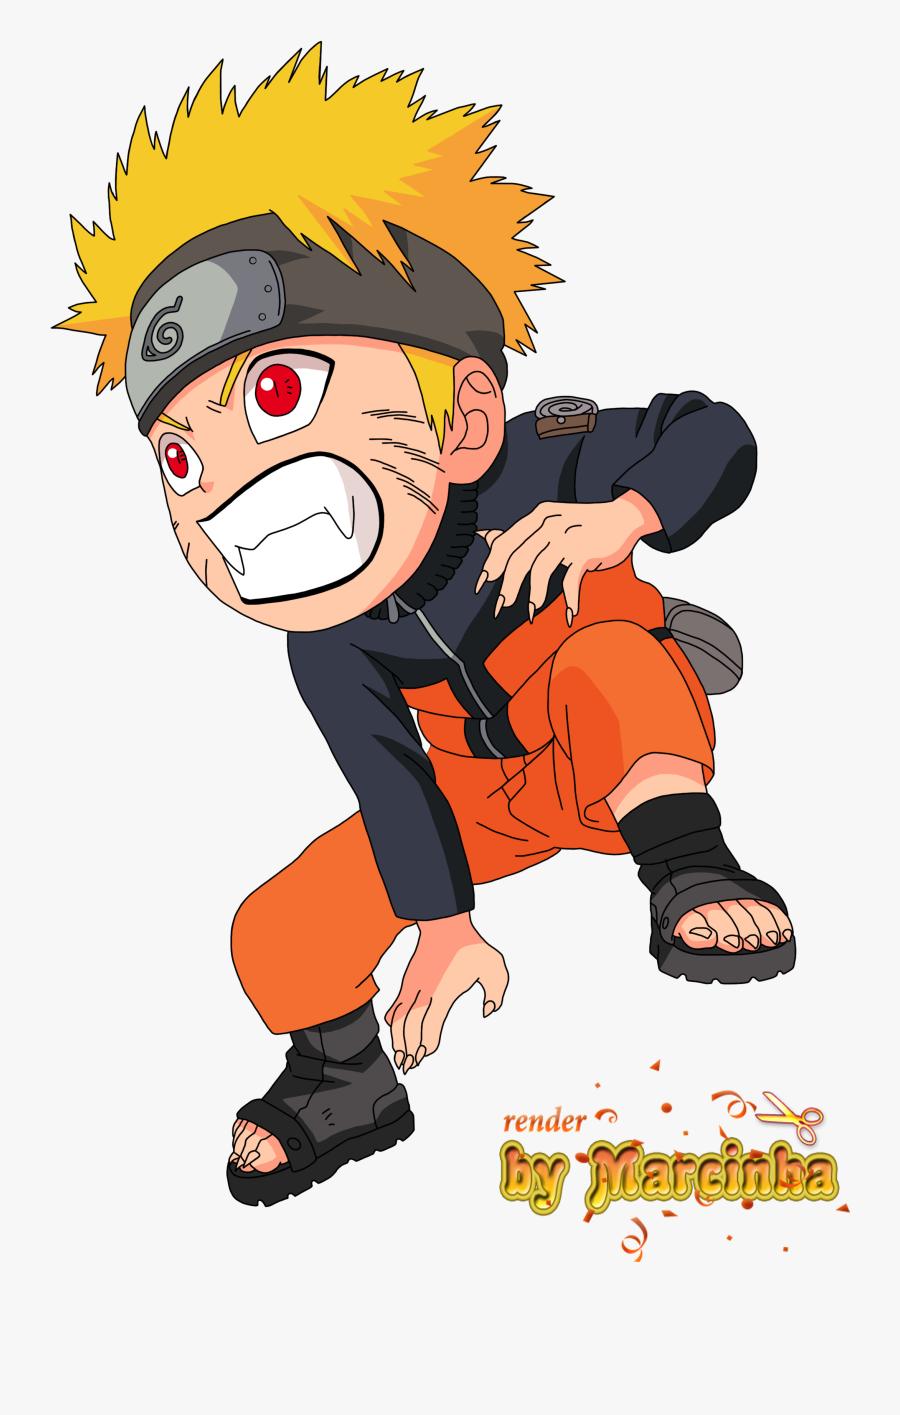 Transparent Naruto Chibi Png - Chibi Naruto, Transparent Clipart